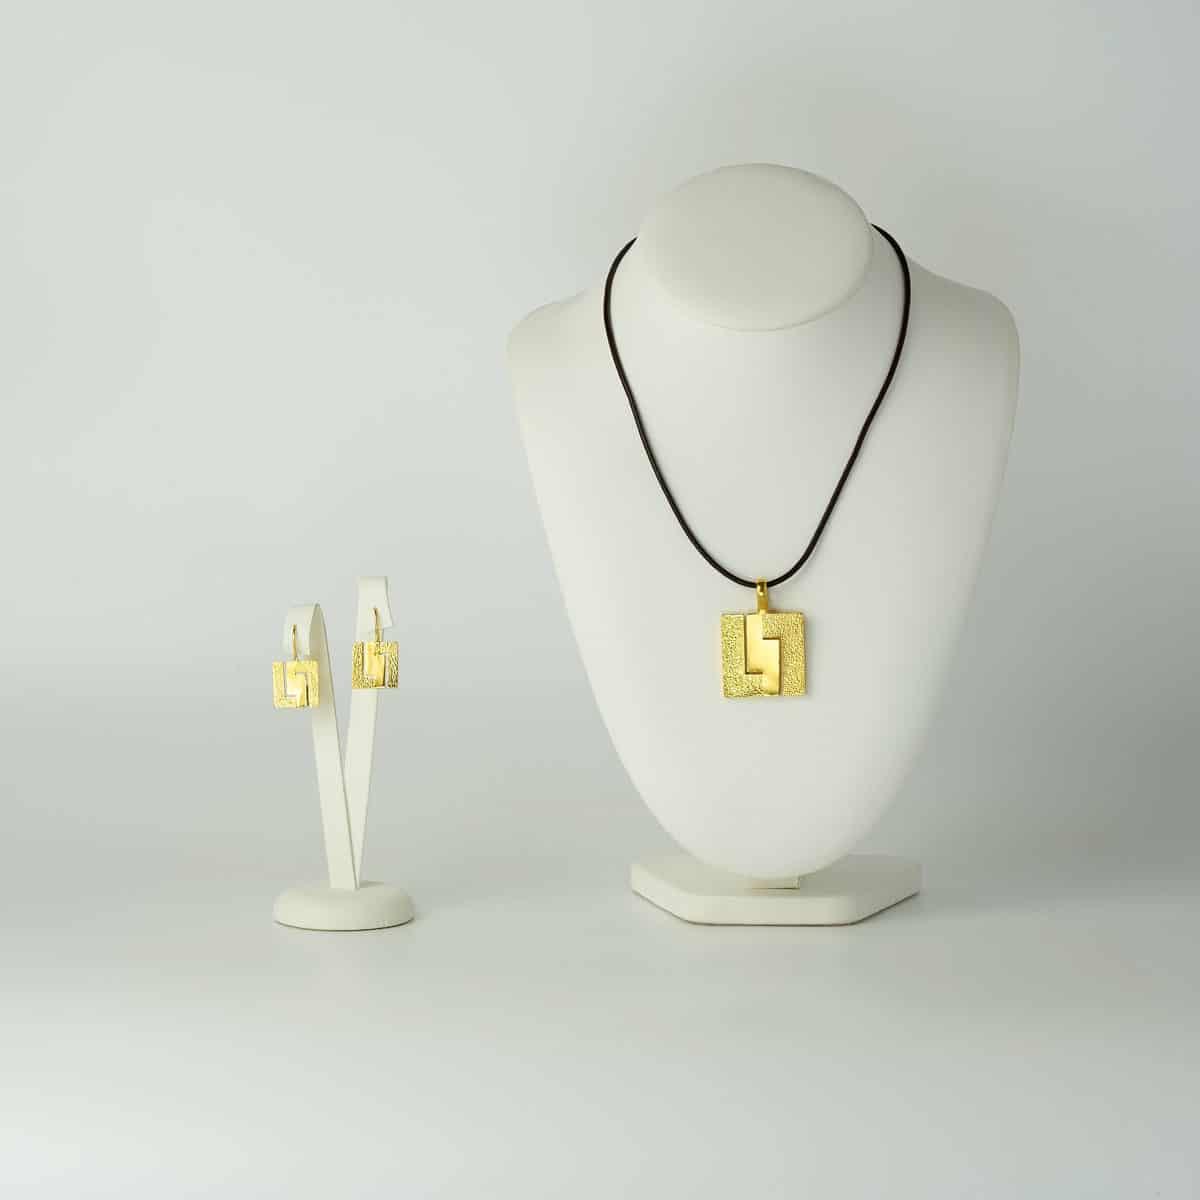 Conjunto de diseño modelo Xeometría, joyería de diseño en plata con baño de oro, Joyas Siliva.